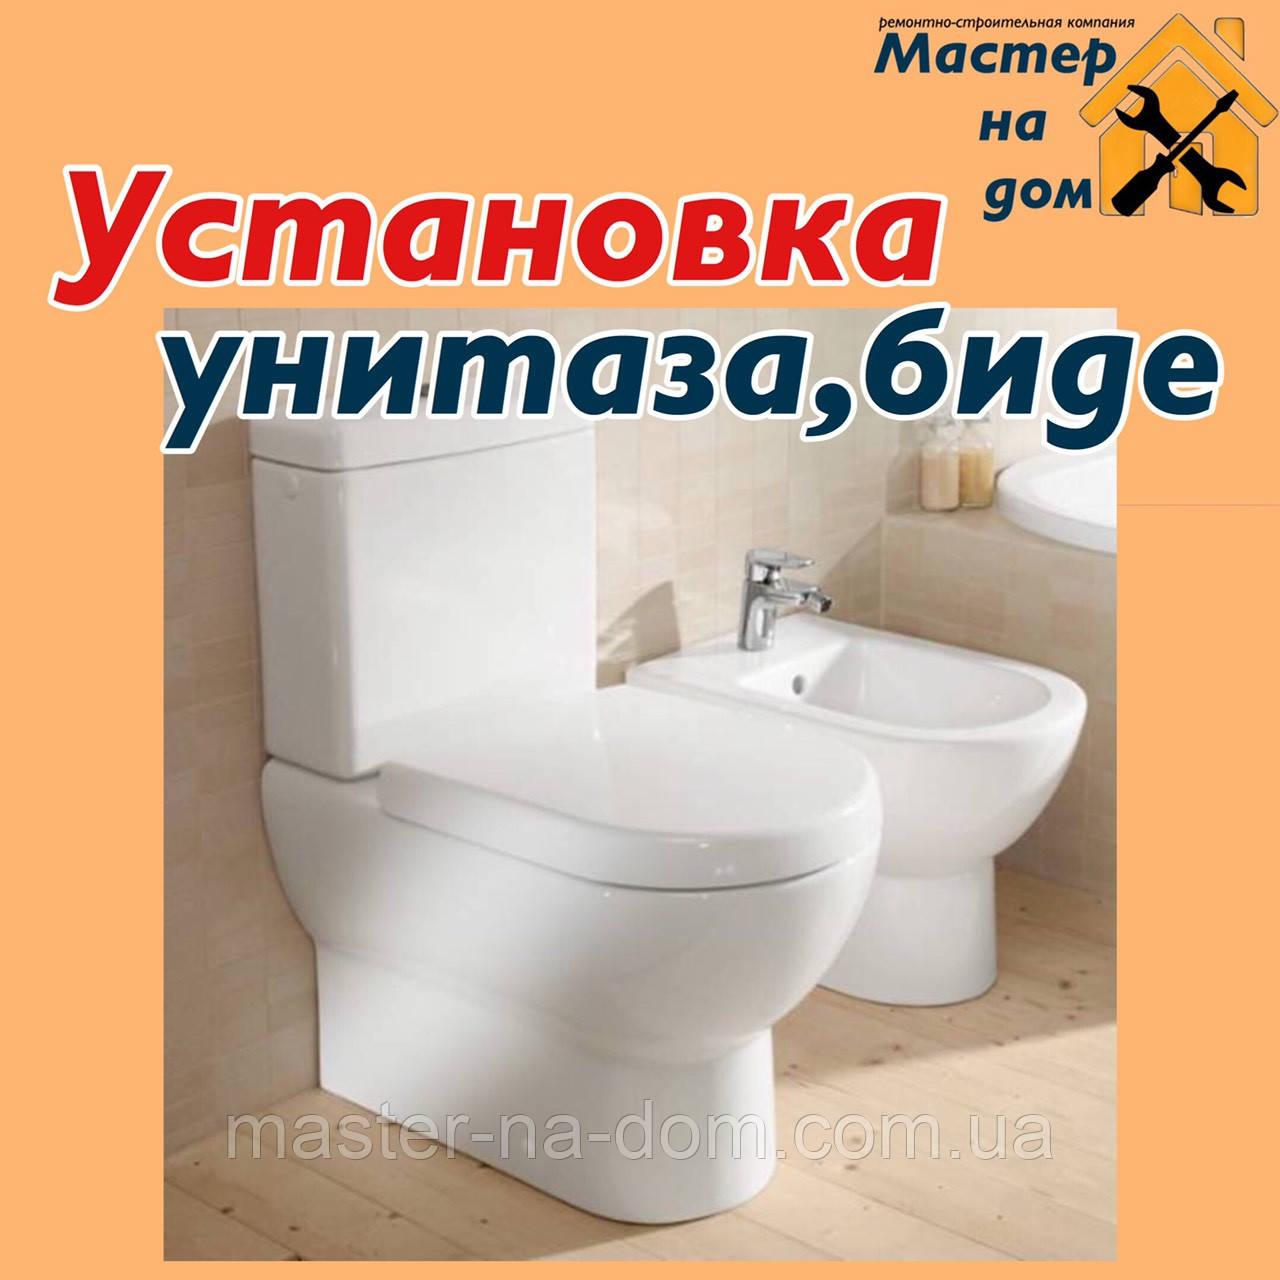 Монтаж унитаза и биде в Запорожье, фото 1